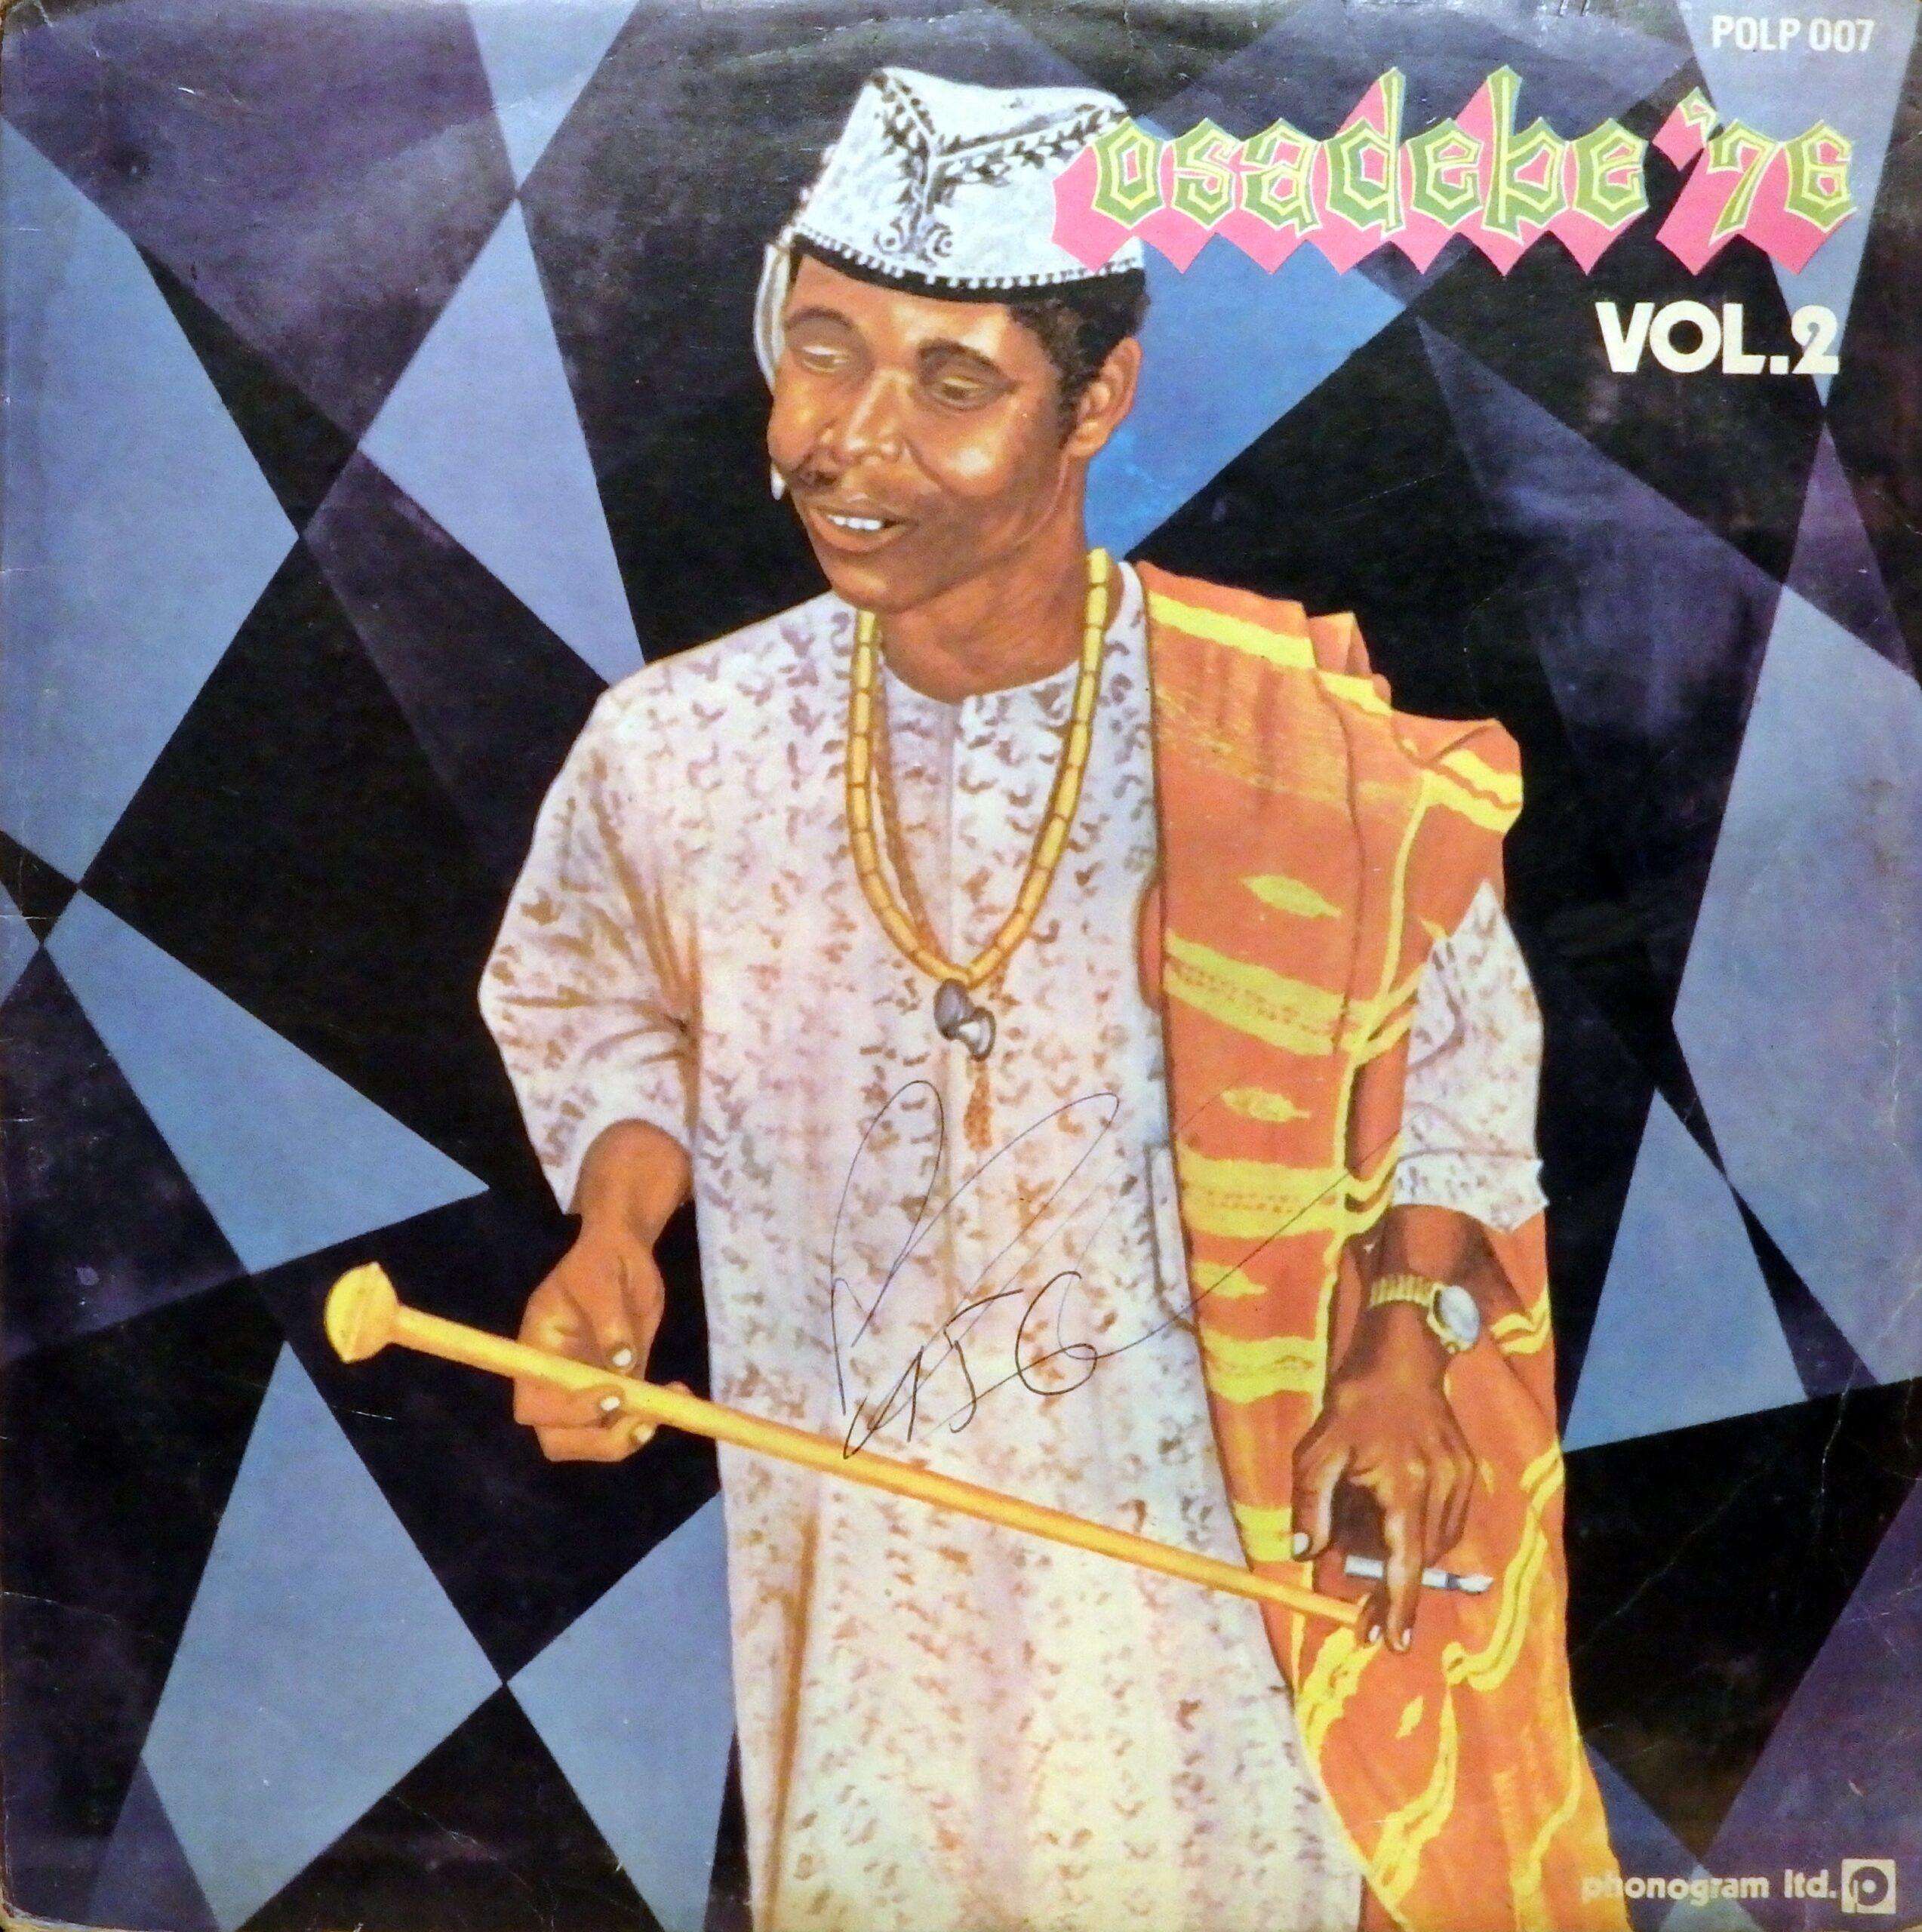 Chief Stephen Osita Osadebe & His Nigeria Sound Makers International – Osadebe '76 Vol. 2 : NIGERIAN Highlife Folk Music ALBUM LP